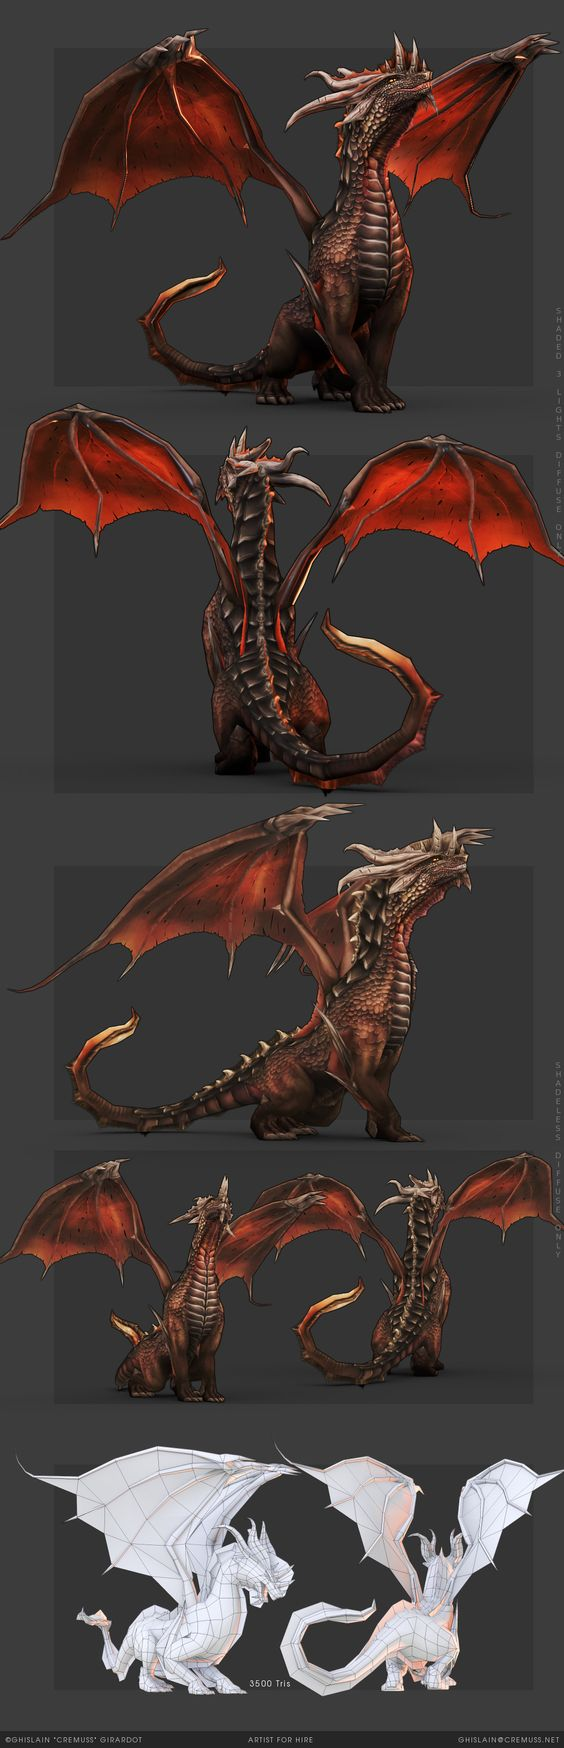 Dragon animation studio